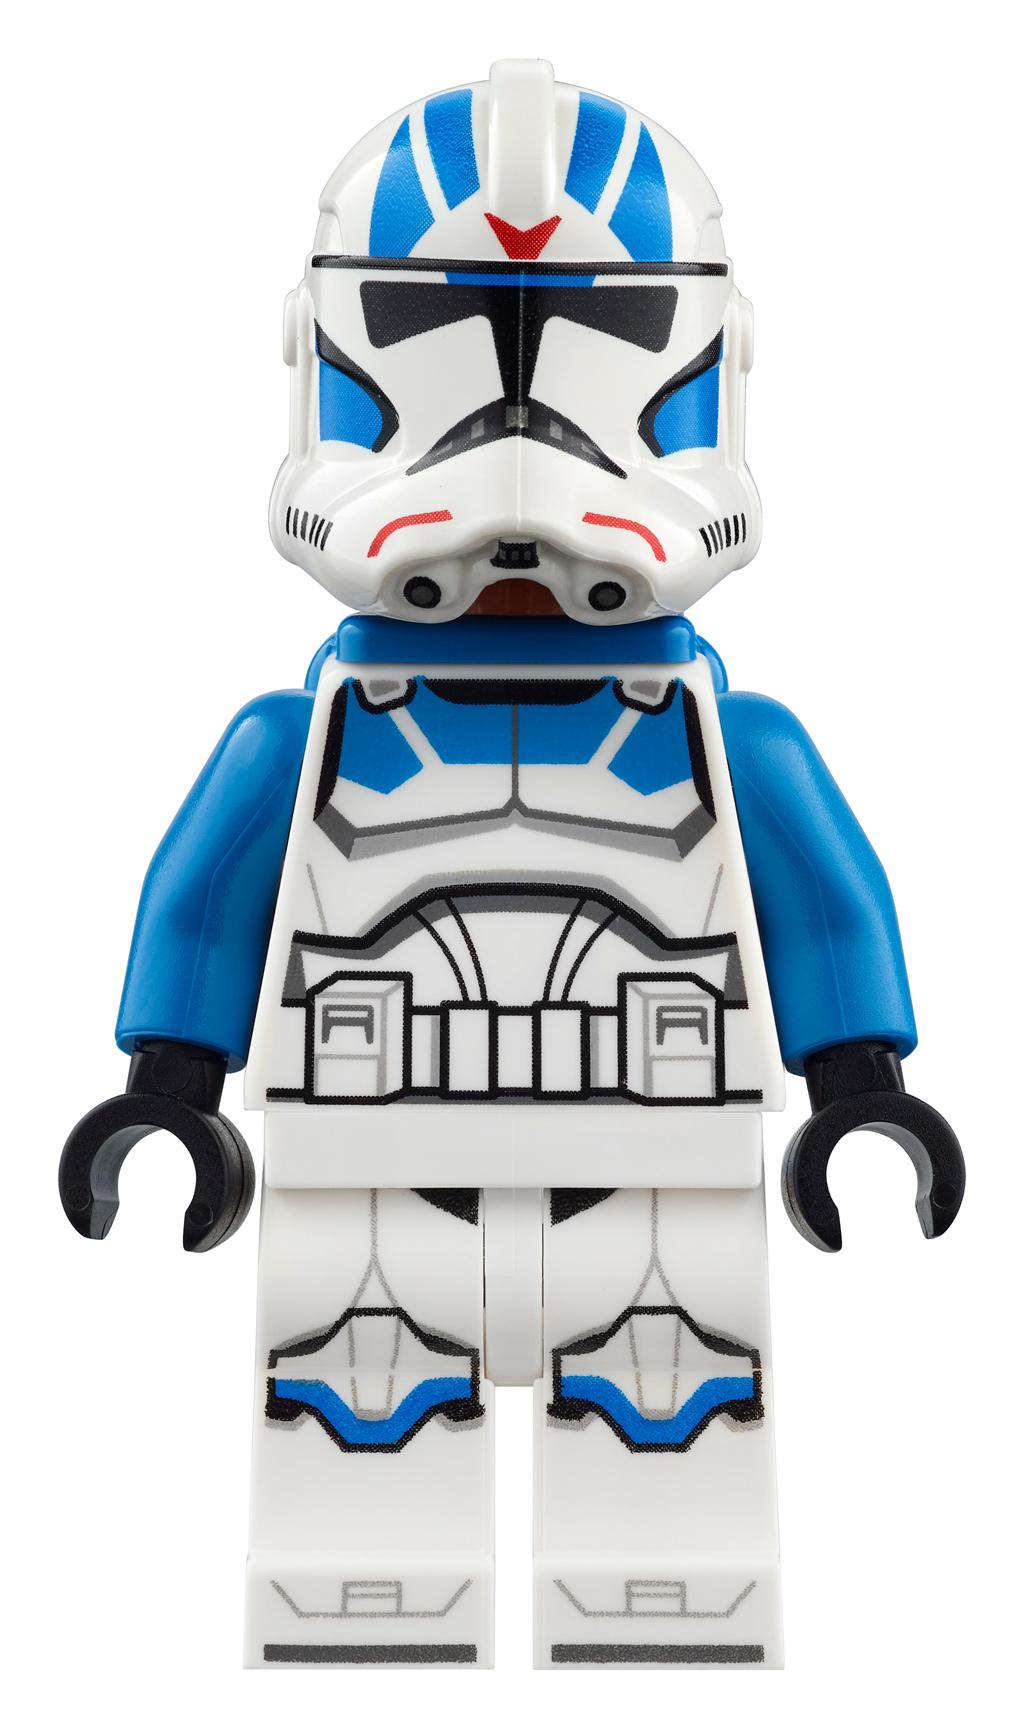 lego-star-wars-75280-501st-legion-clone-troopers-2020-minifigur zusammengebaut.com